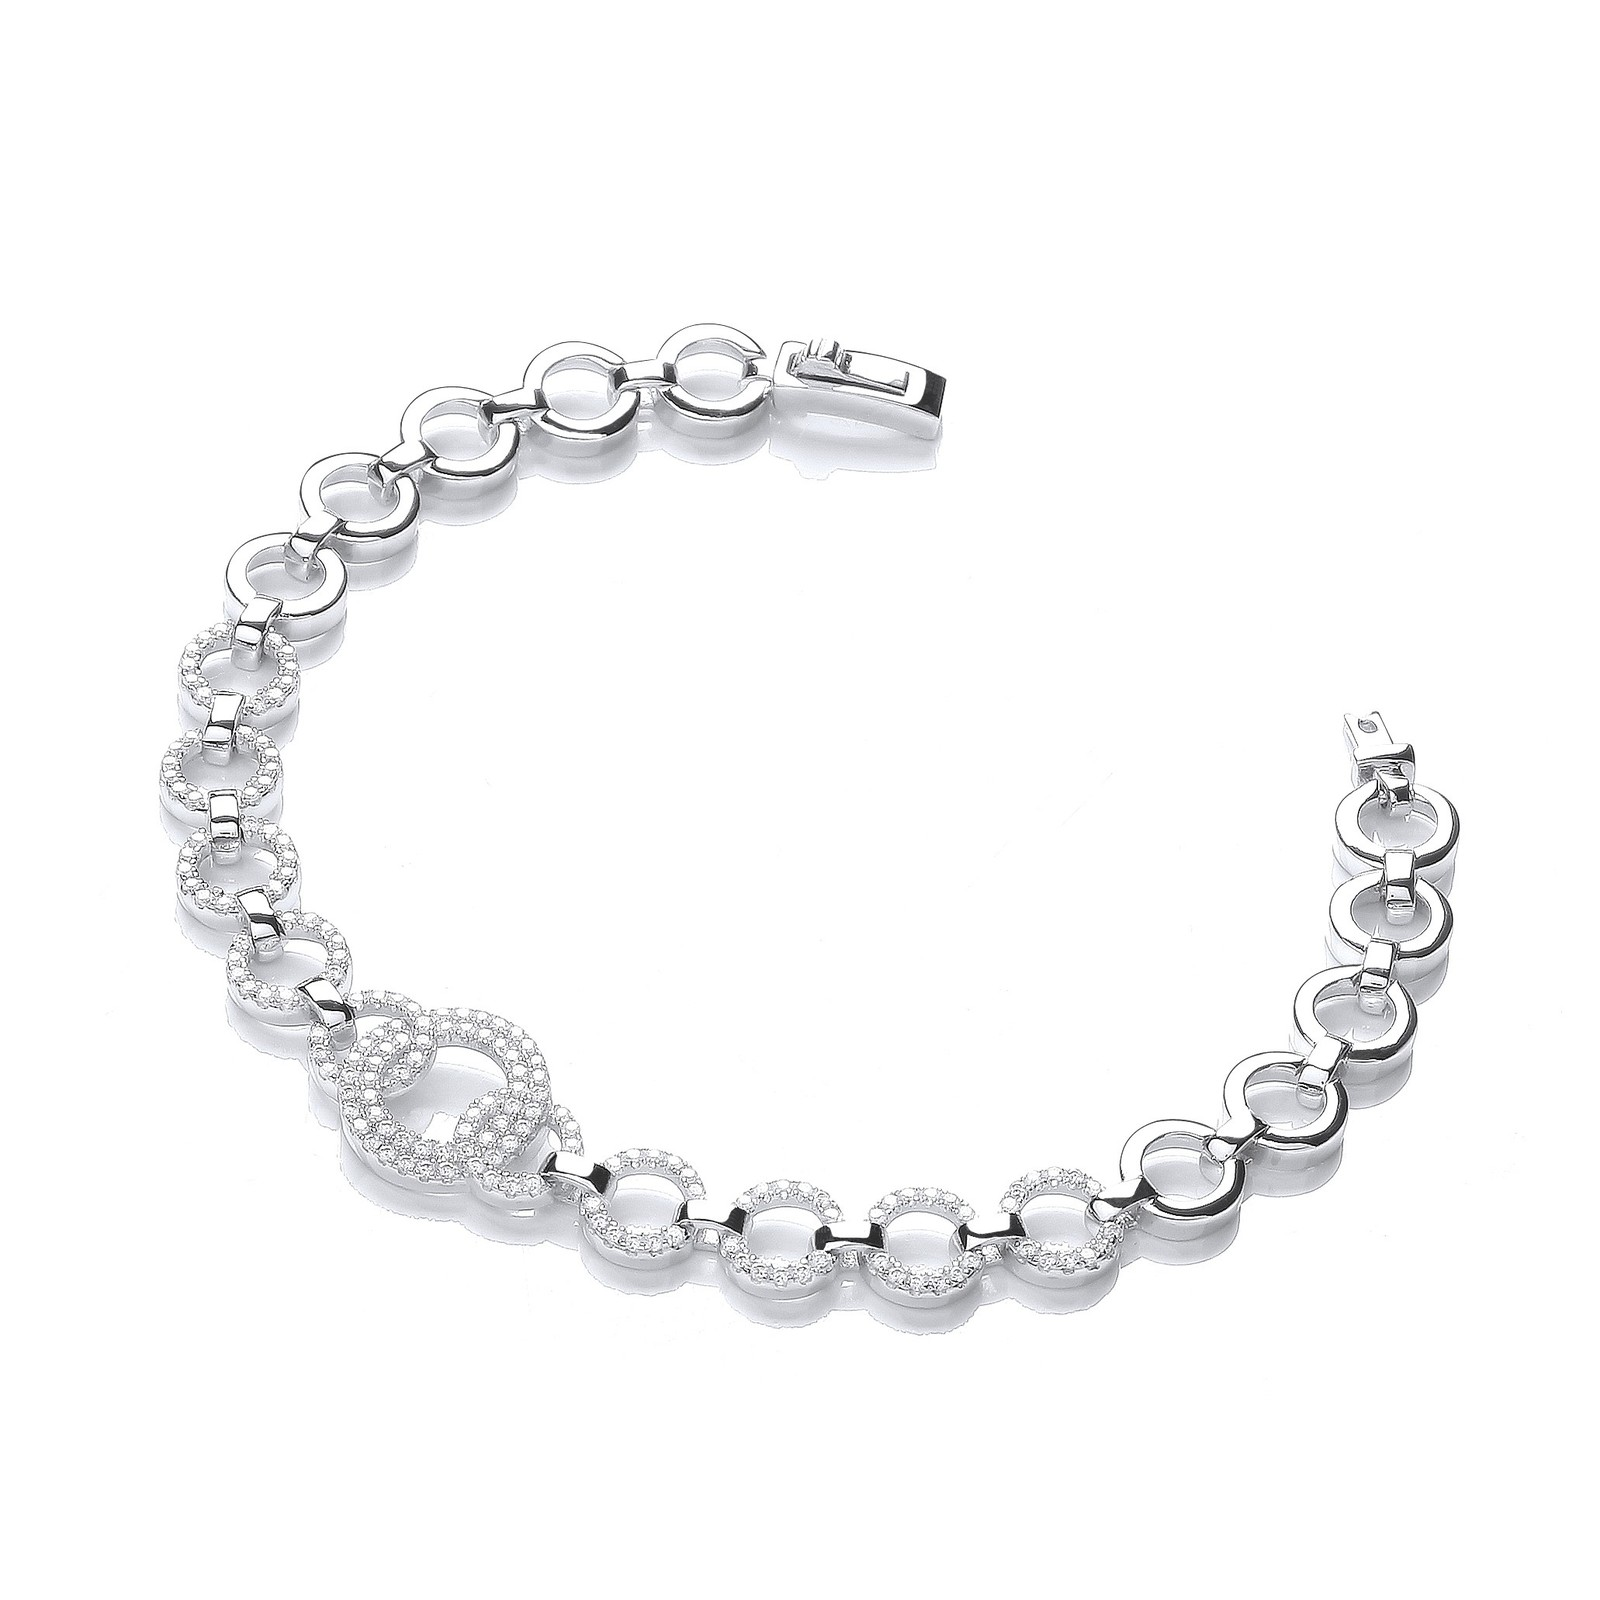 "Micro Pave' 164 White Cz's Bracelet 7.5""/19cm"